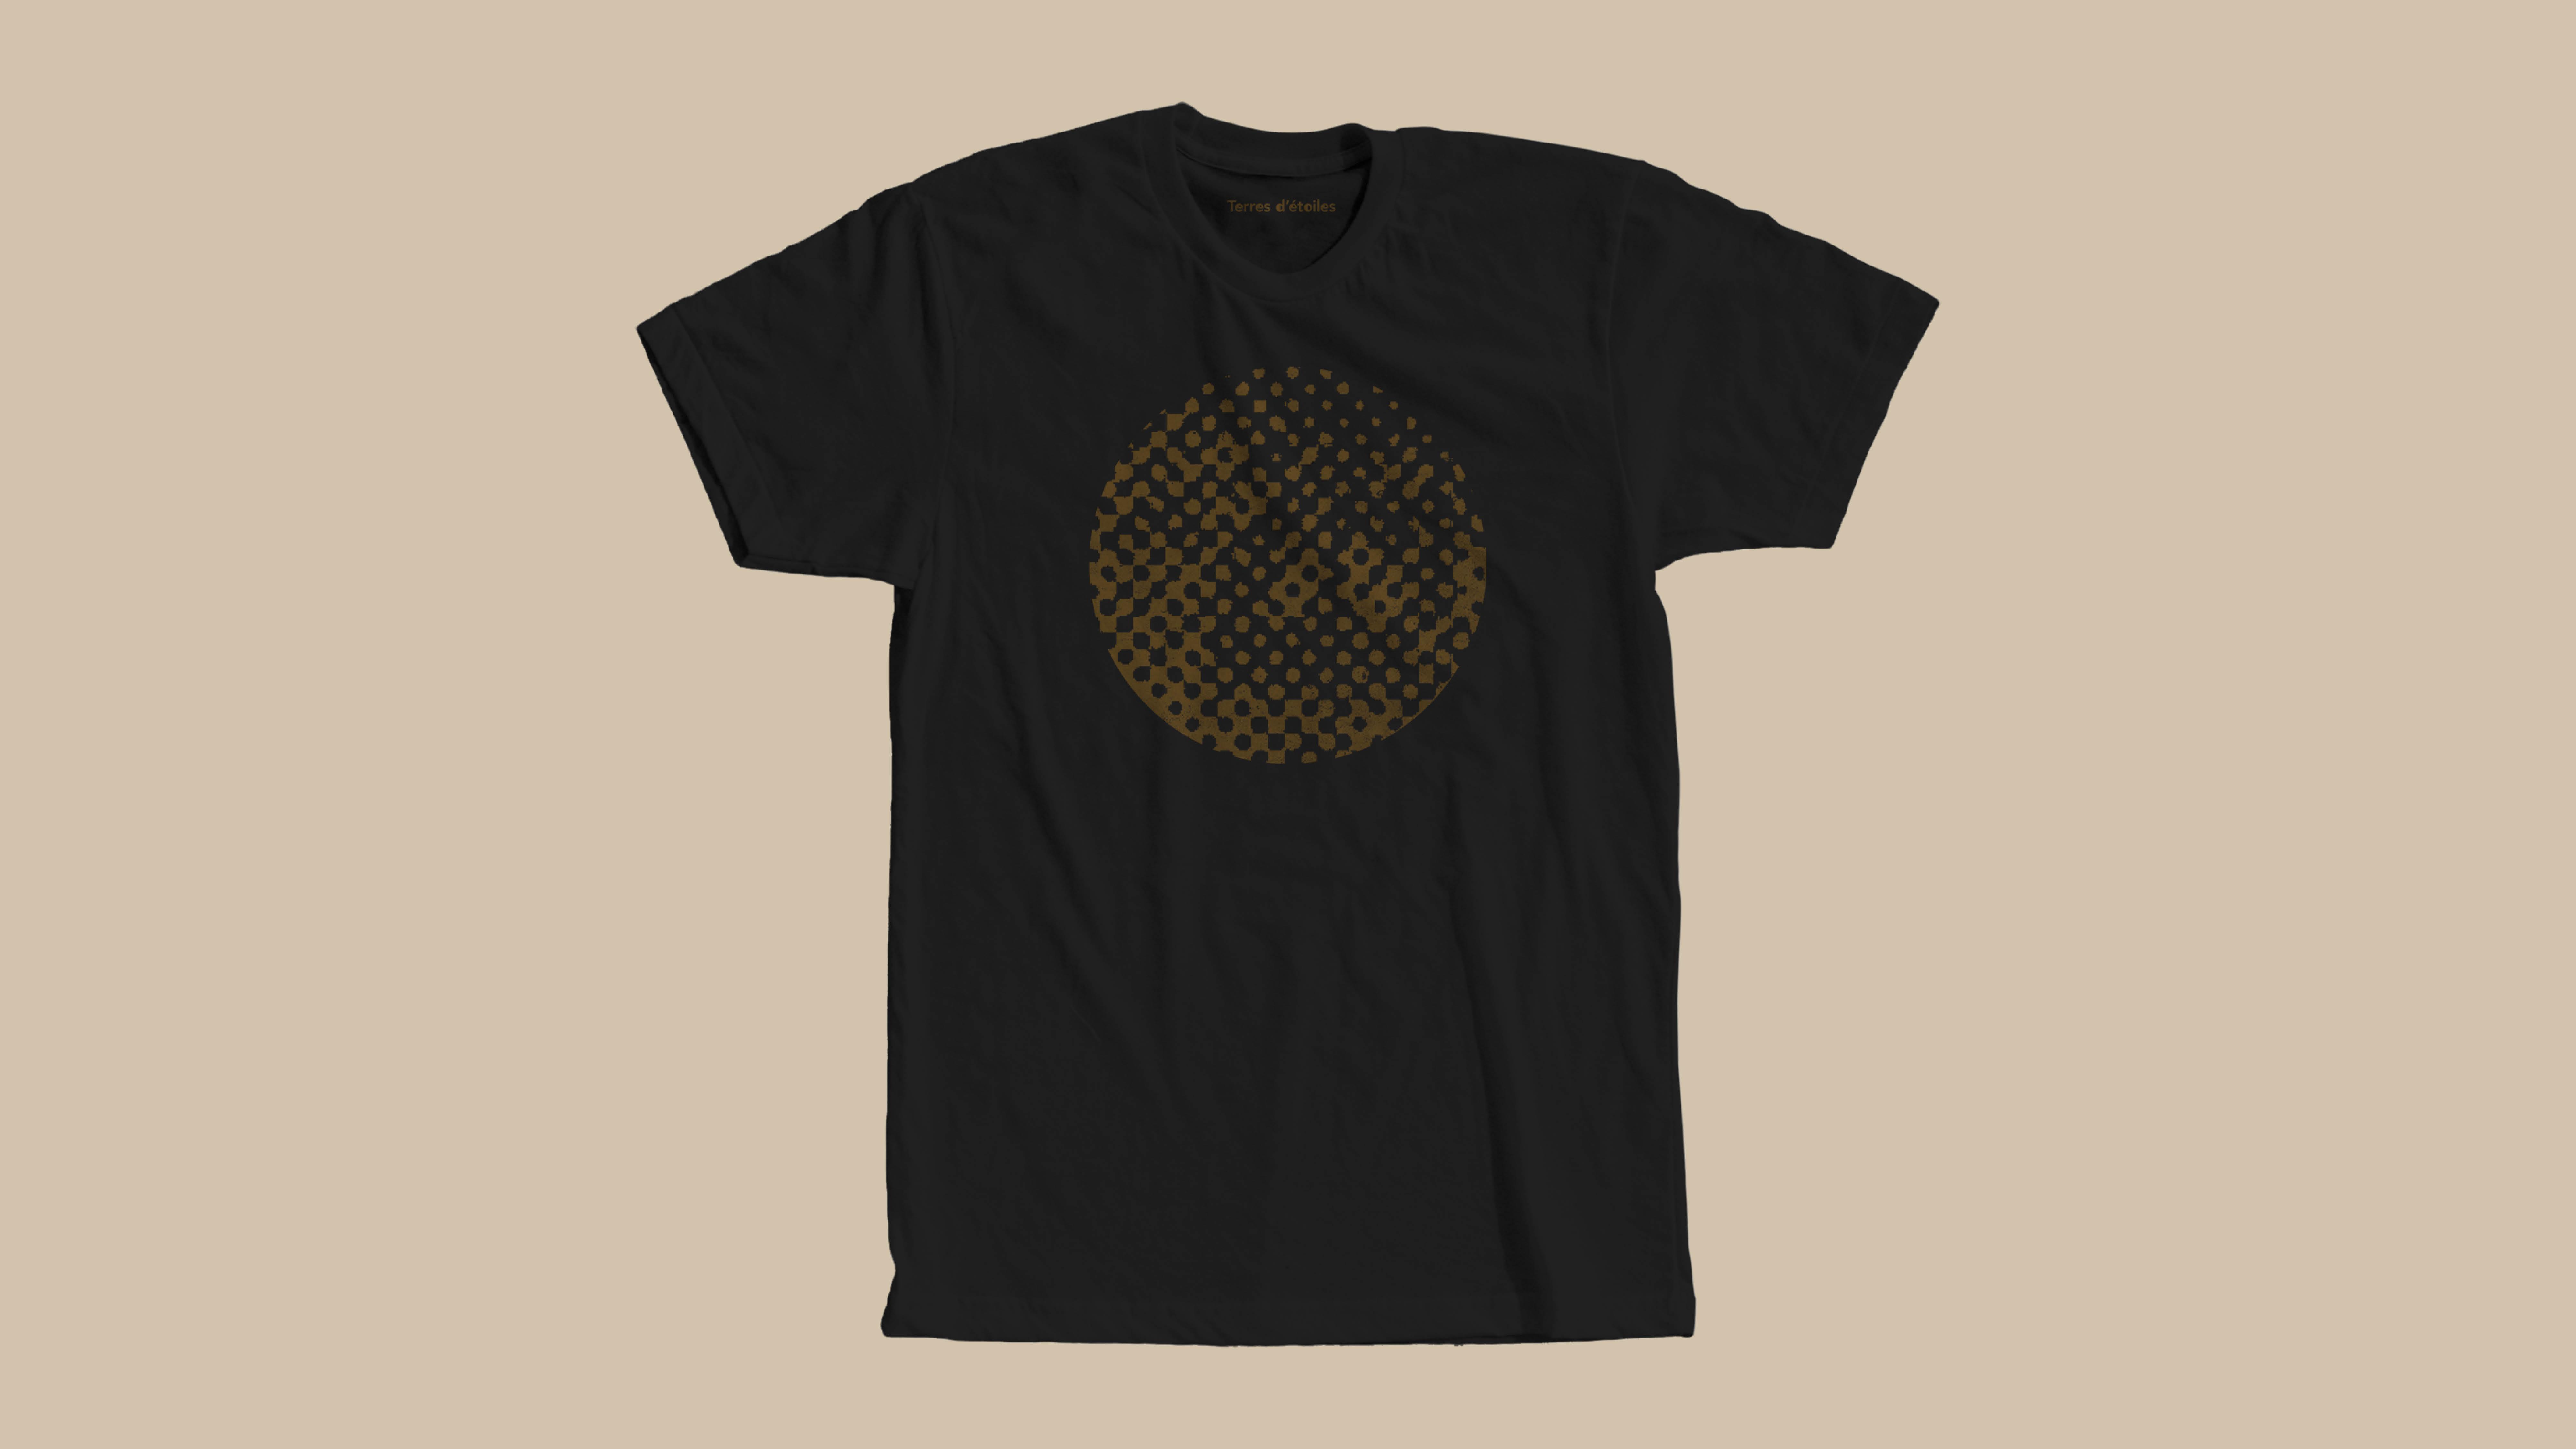 T-shirt Terres d'étoiles domaine Christophe Mittnacht